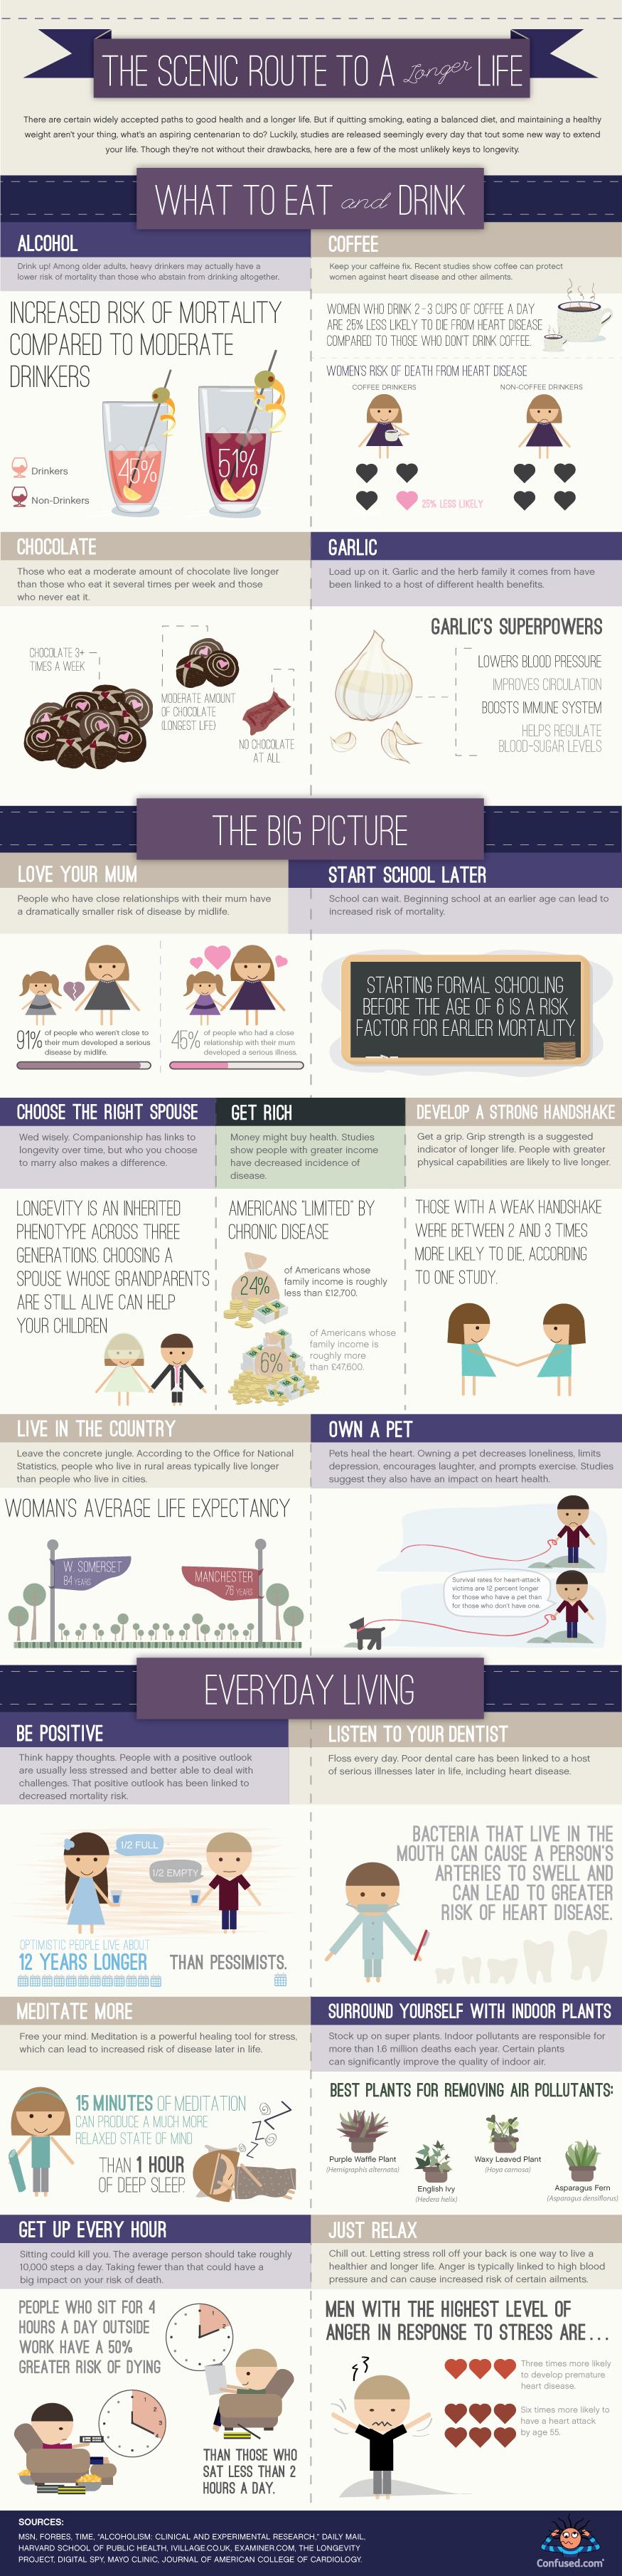 longer life infographic